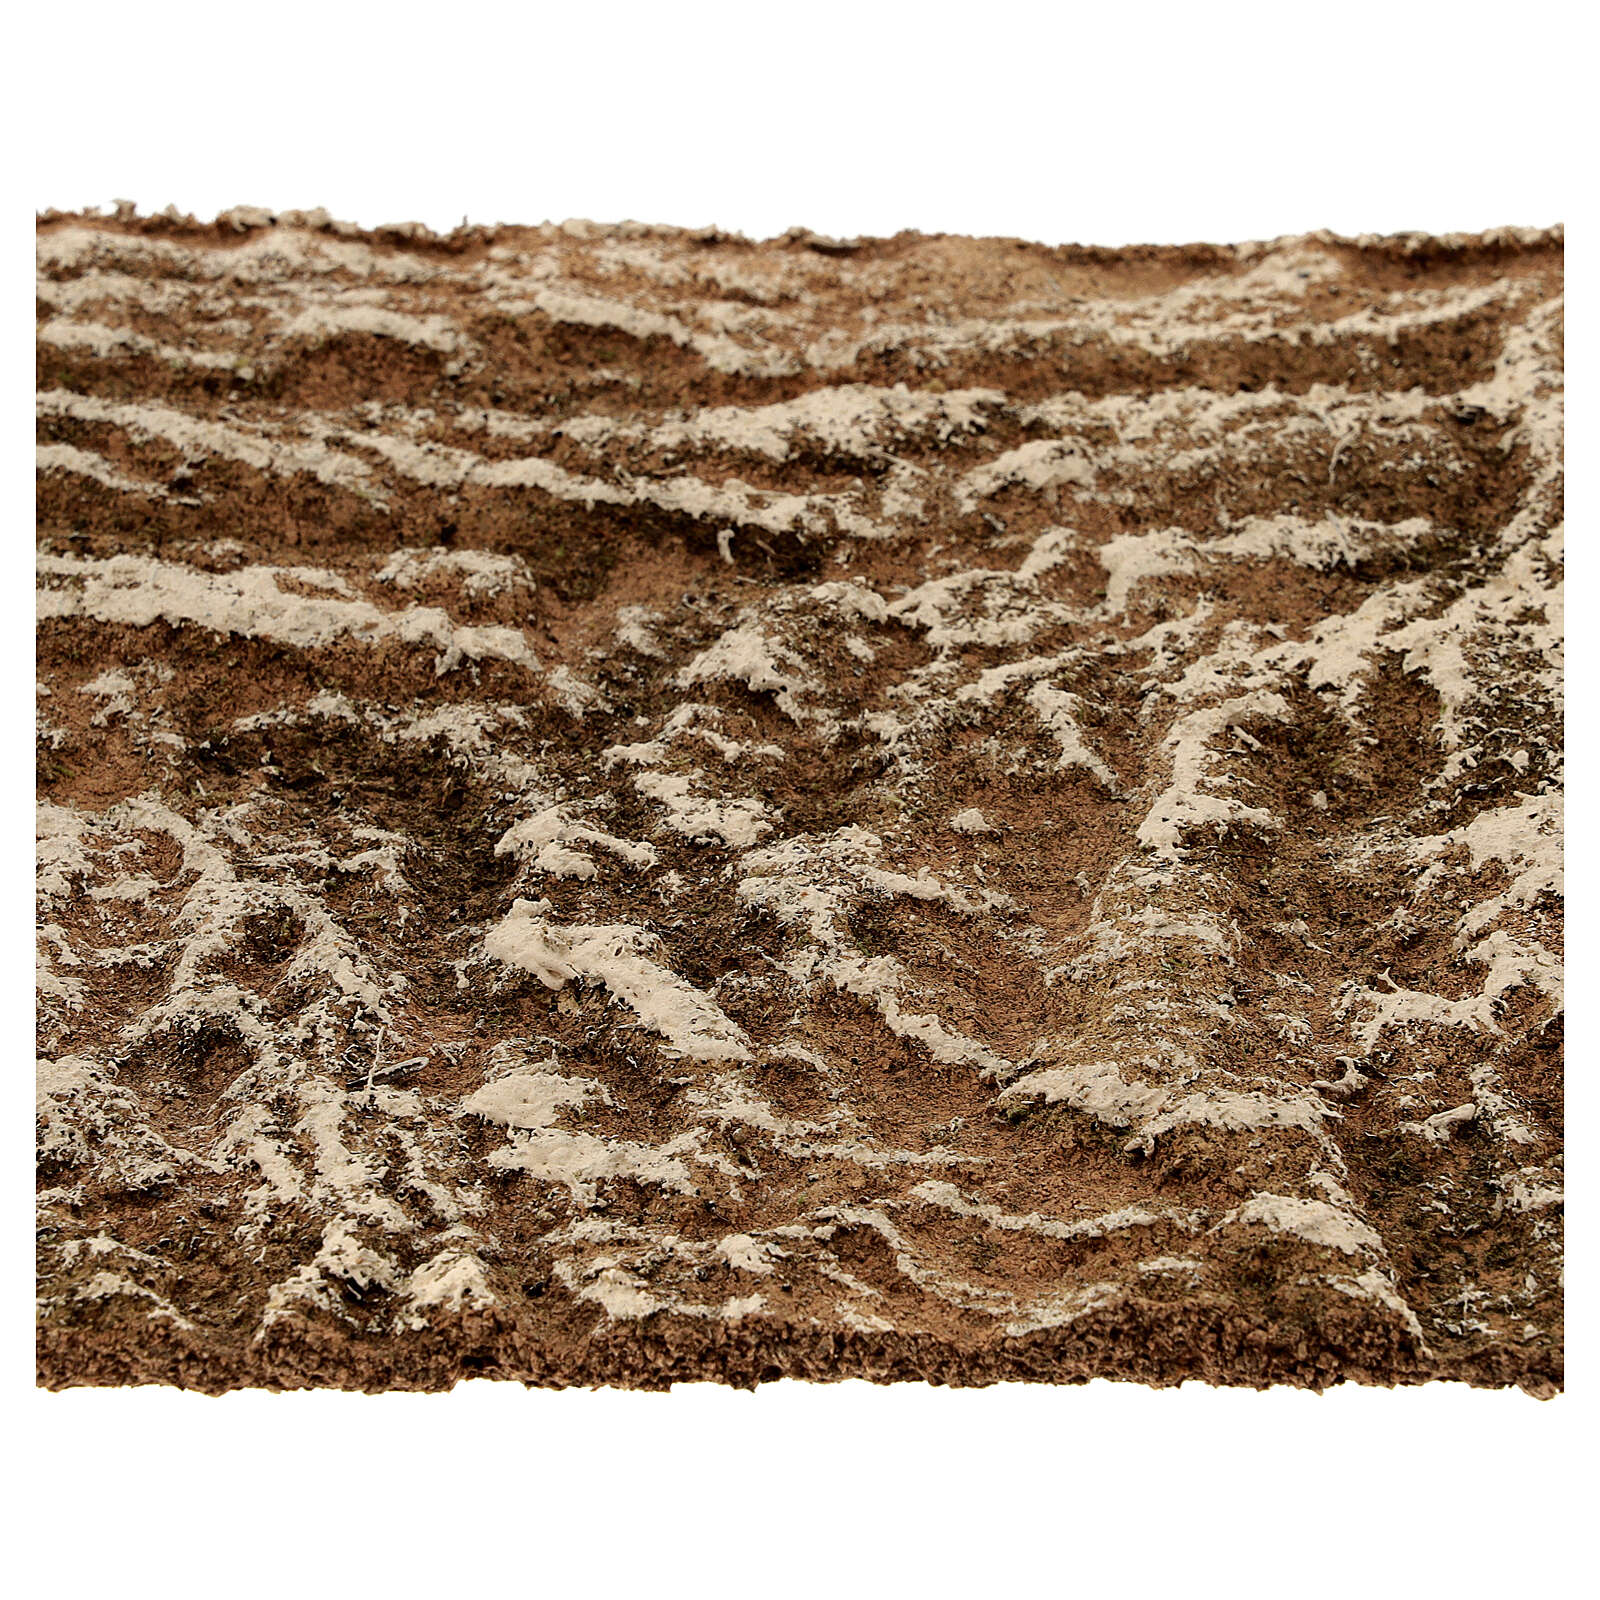 Panel corcho belén tipo corteza natural 33x25x1 cm 4